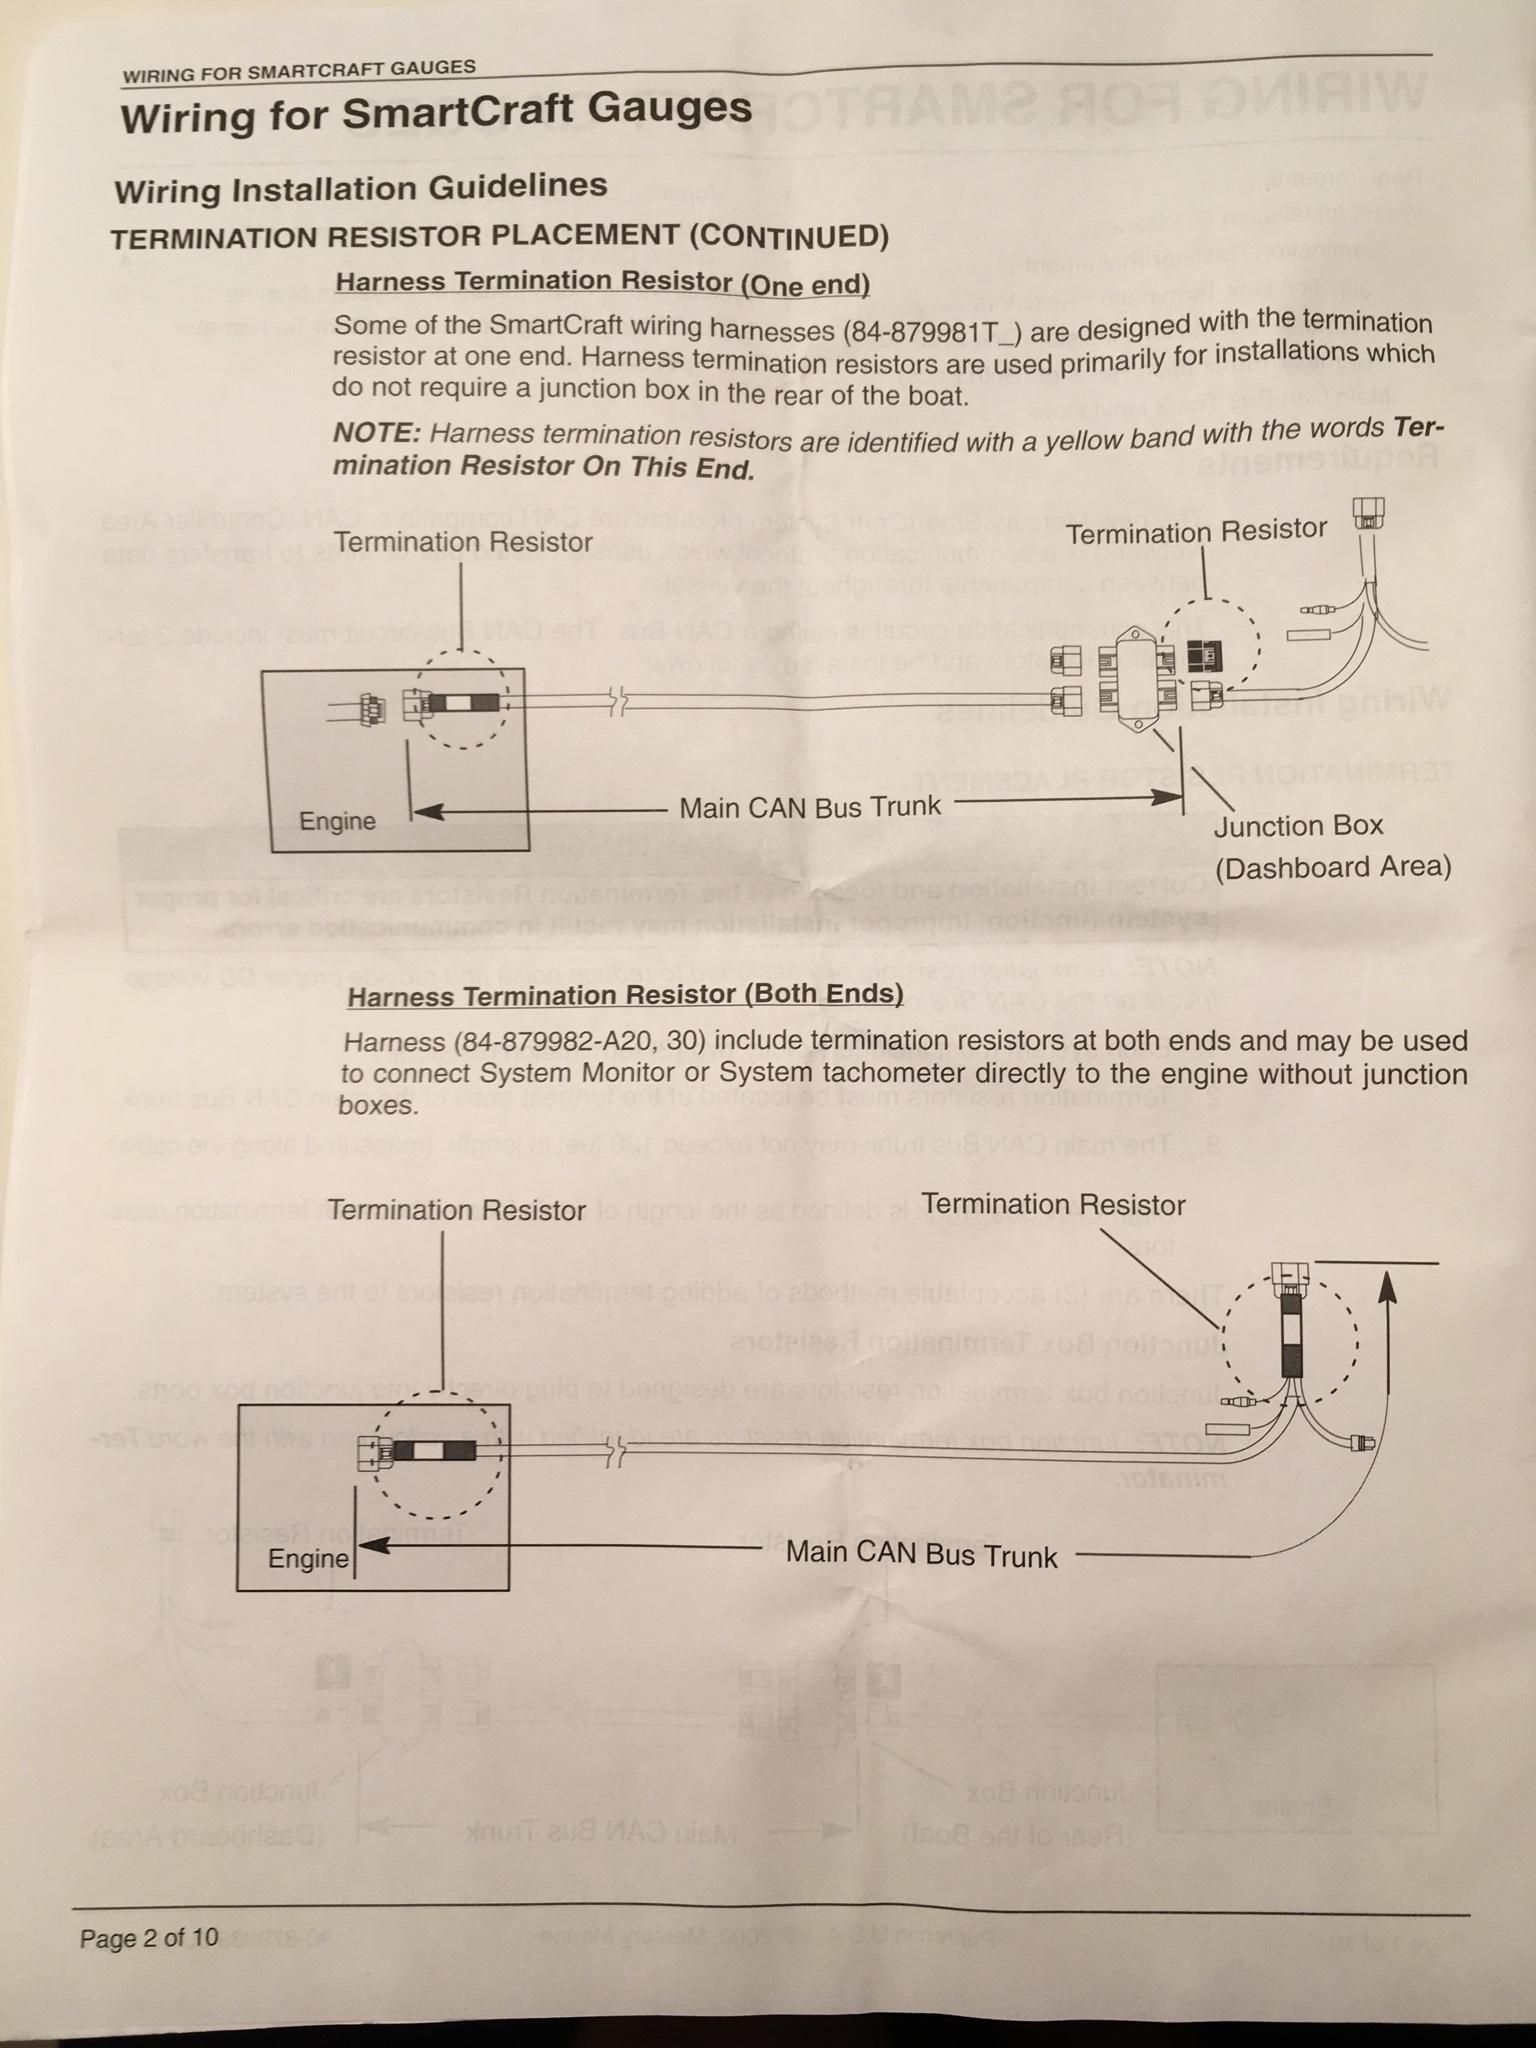 Alumacraft Wiring Diagram Tach Great Design Of Stewart Warner Schematic Diagrams Rh Bestkodiaddons Co Tachometer 429371